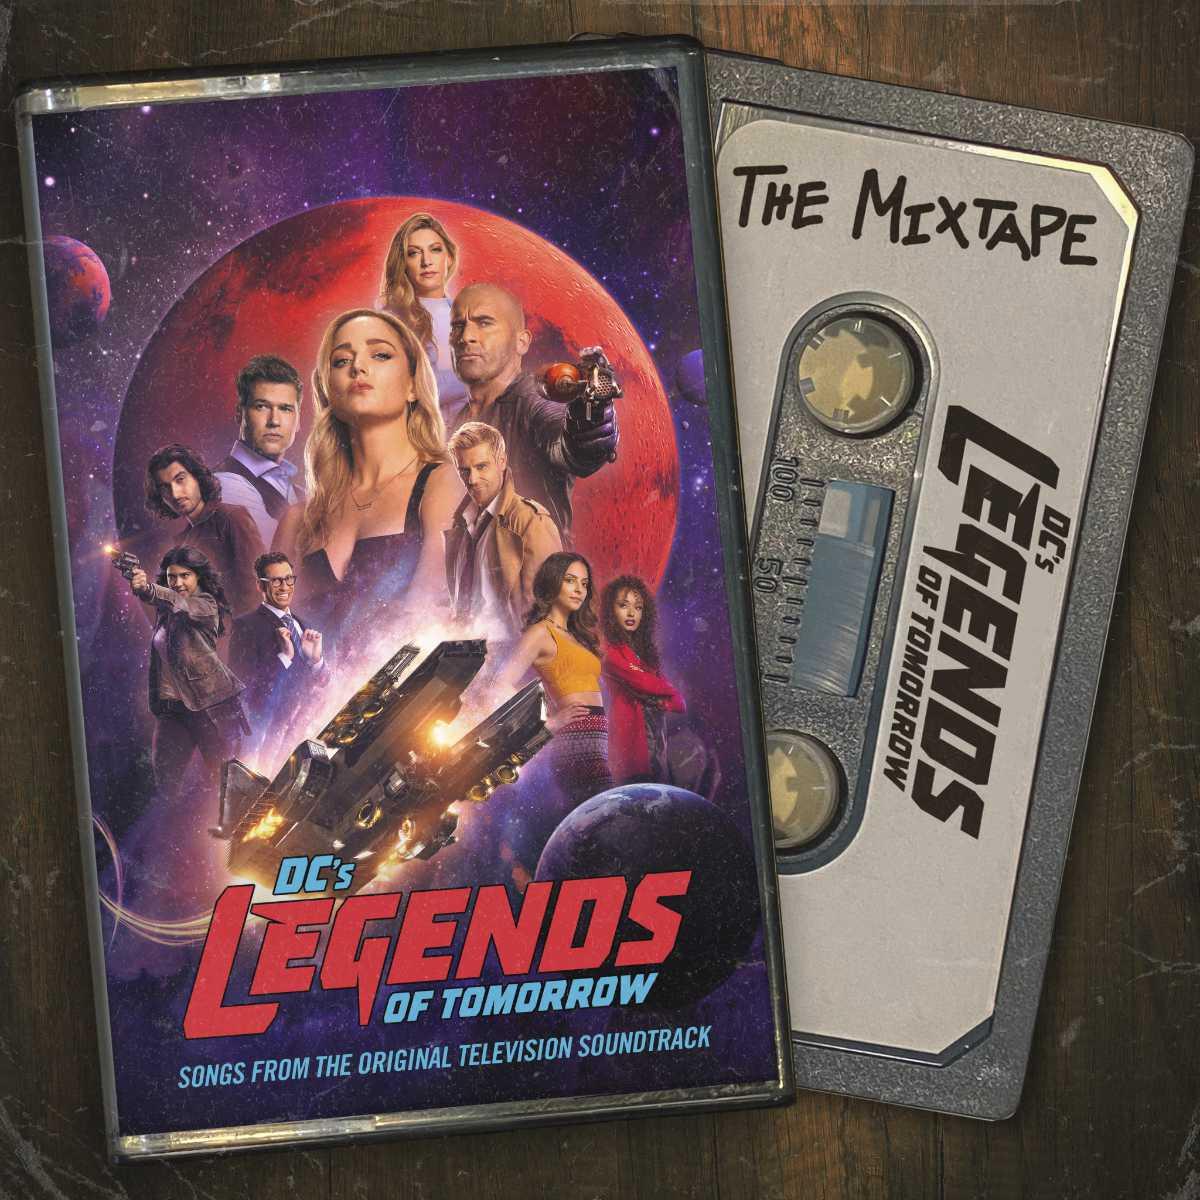 DC's Legends of Tomorrow: The Mixtape